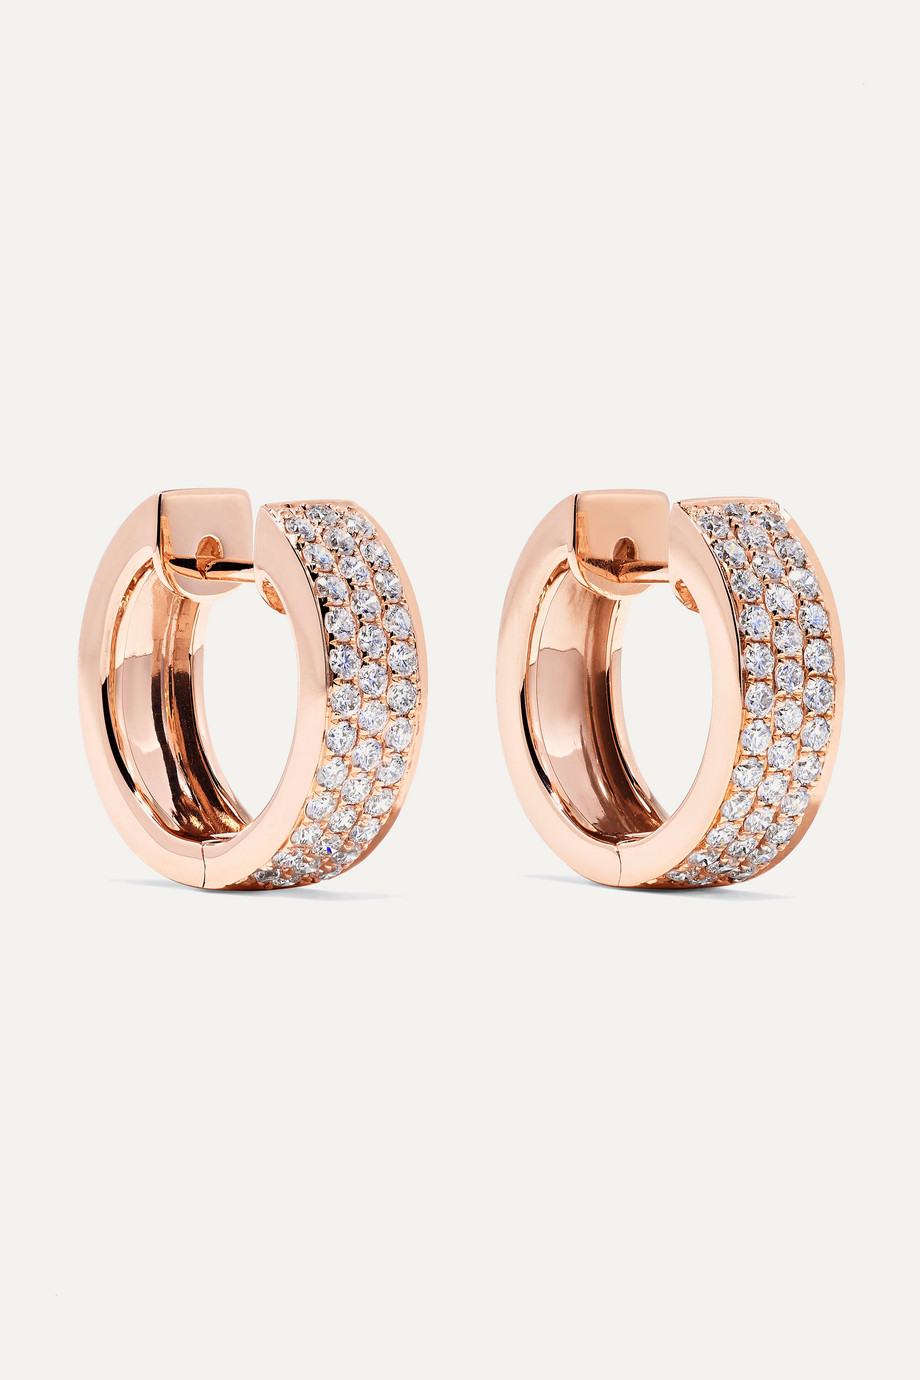 Anita Ko Huggies Creolen aus 18 Karat Roségold mit Diamanten